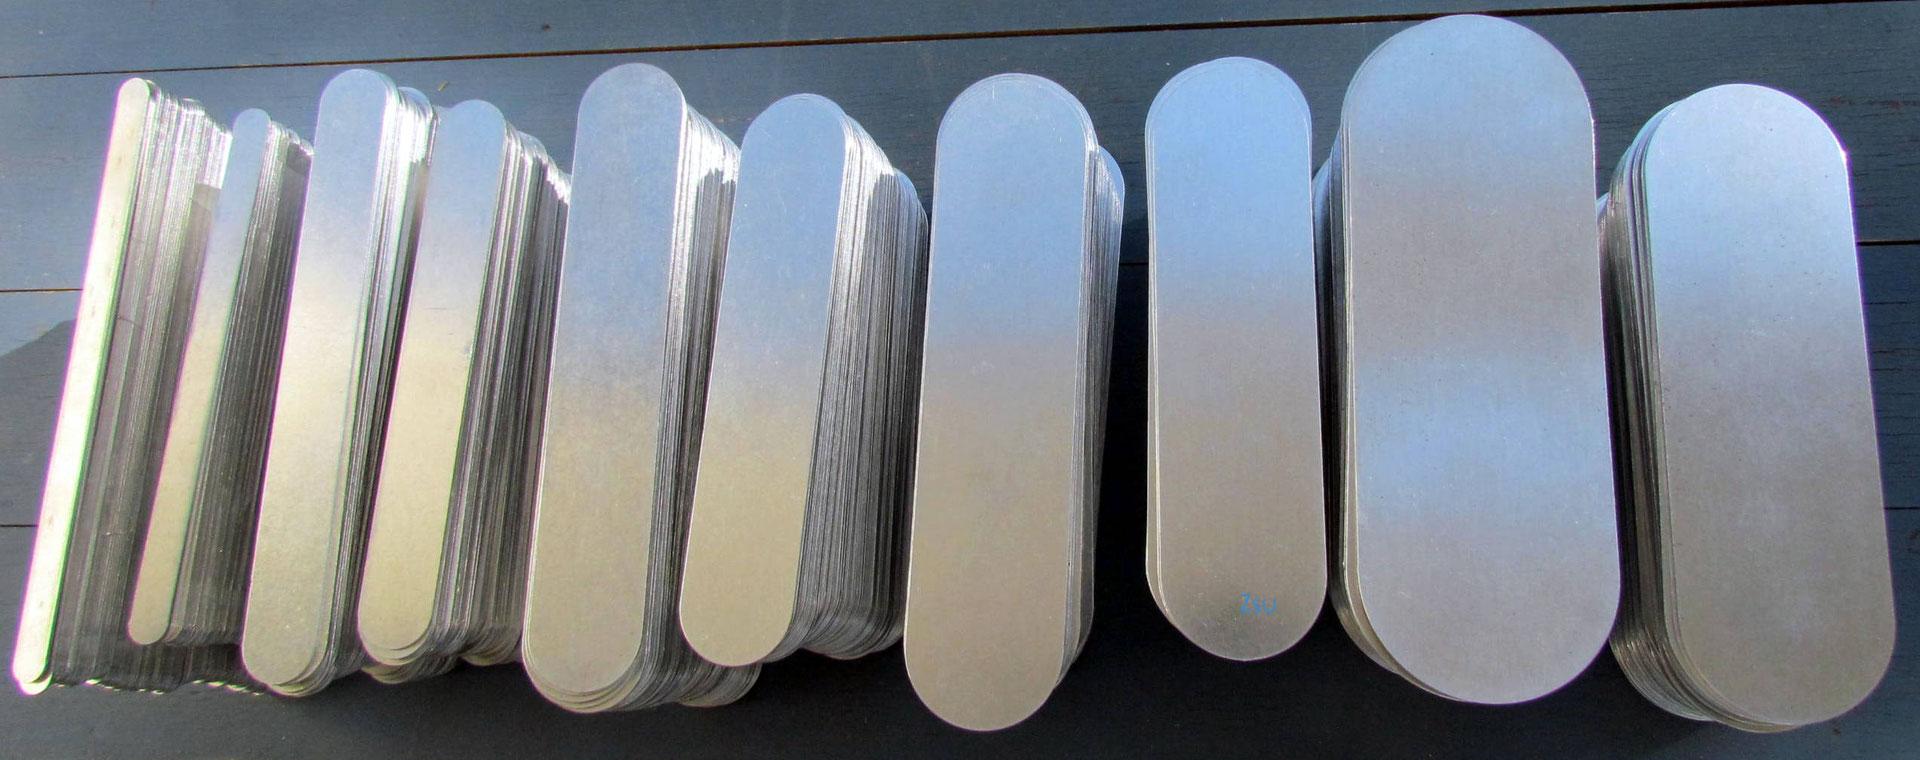 Armreif Rohlinge aus Aluminium  Schmuck Polymer Clay